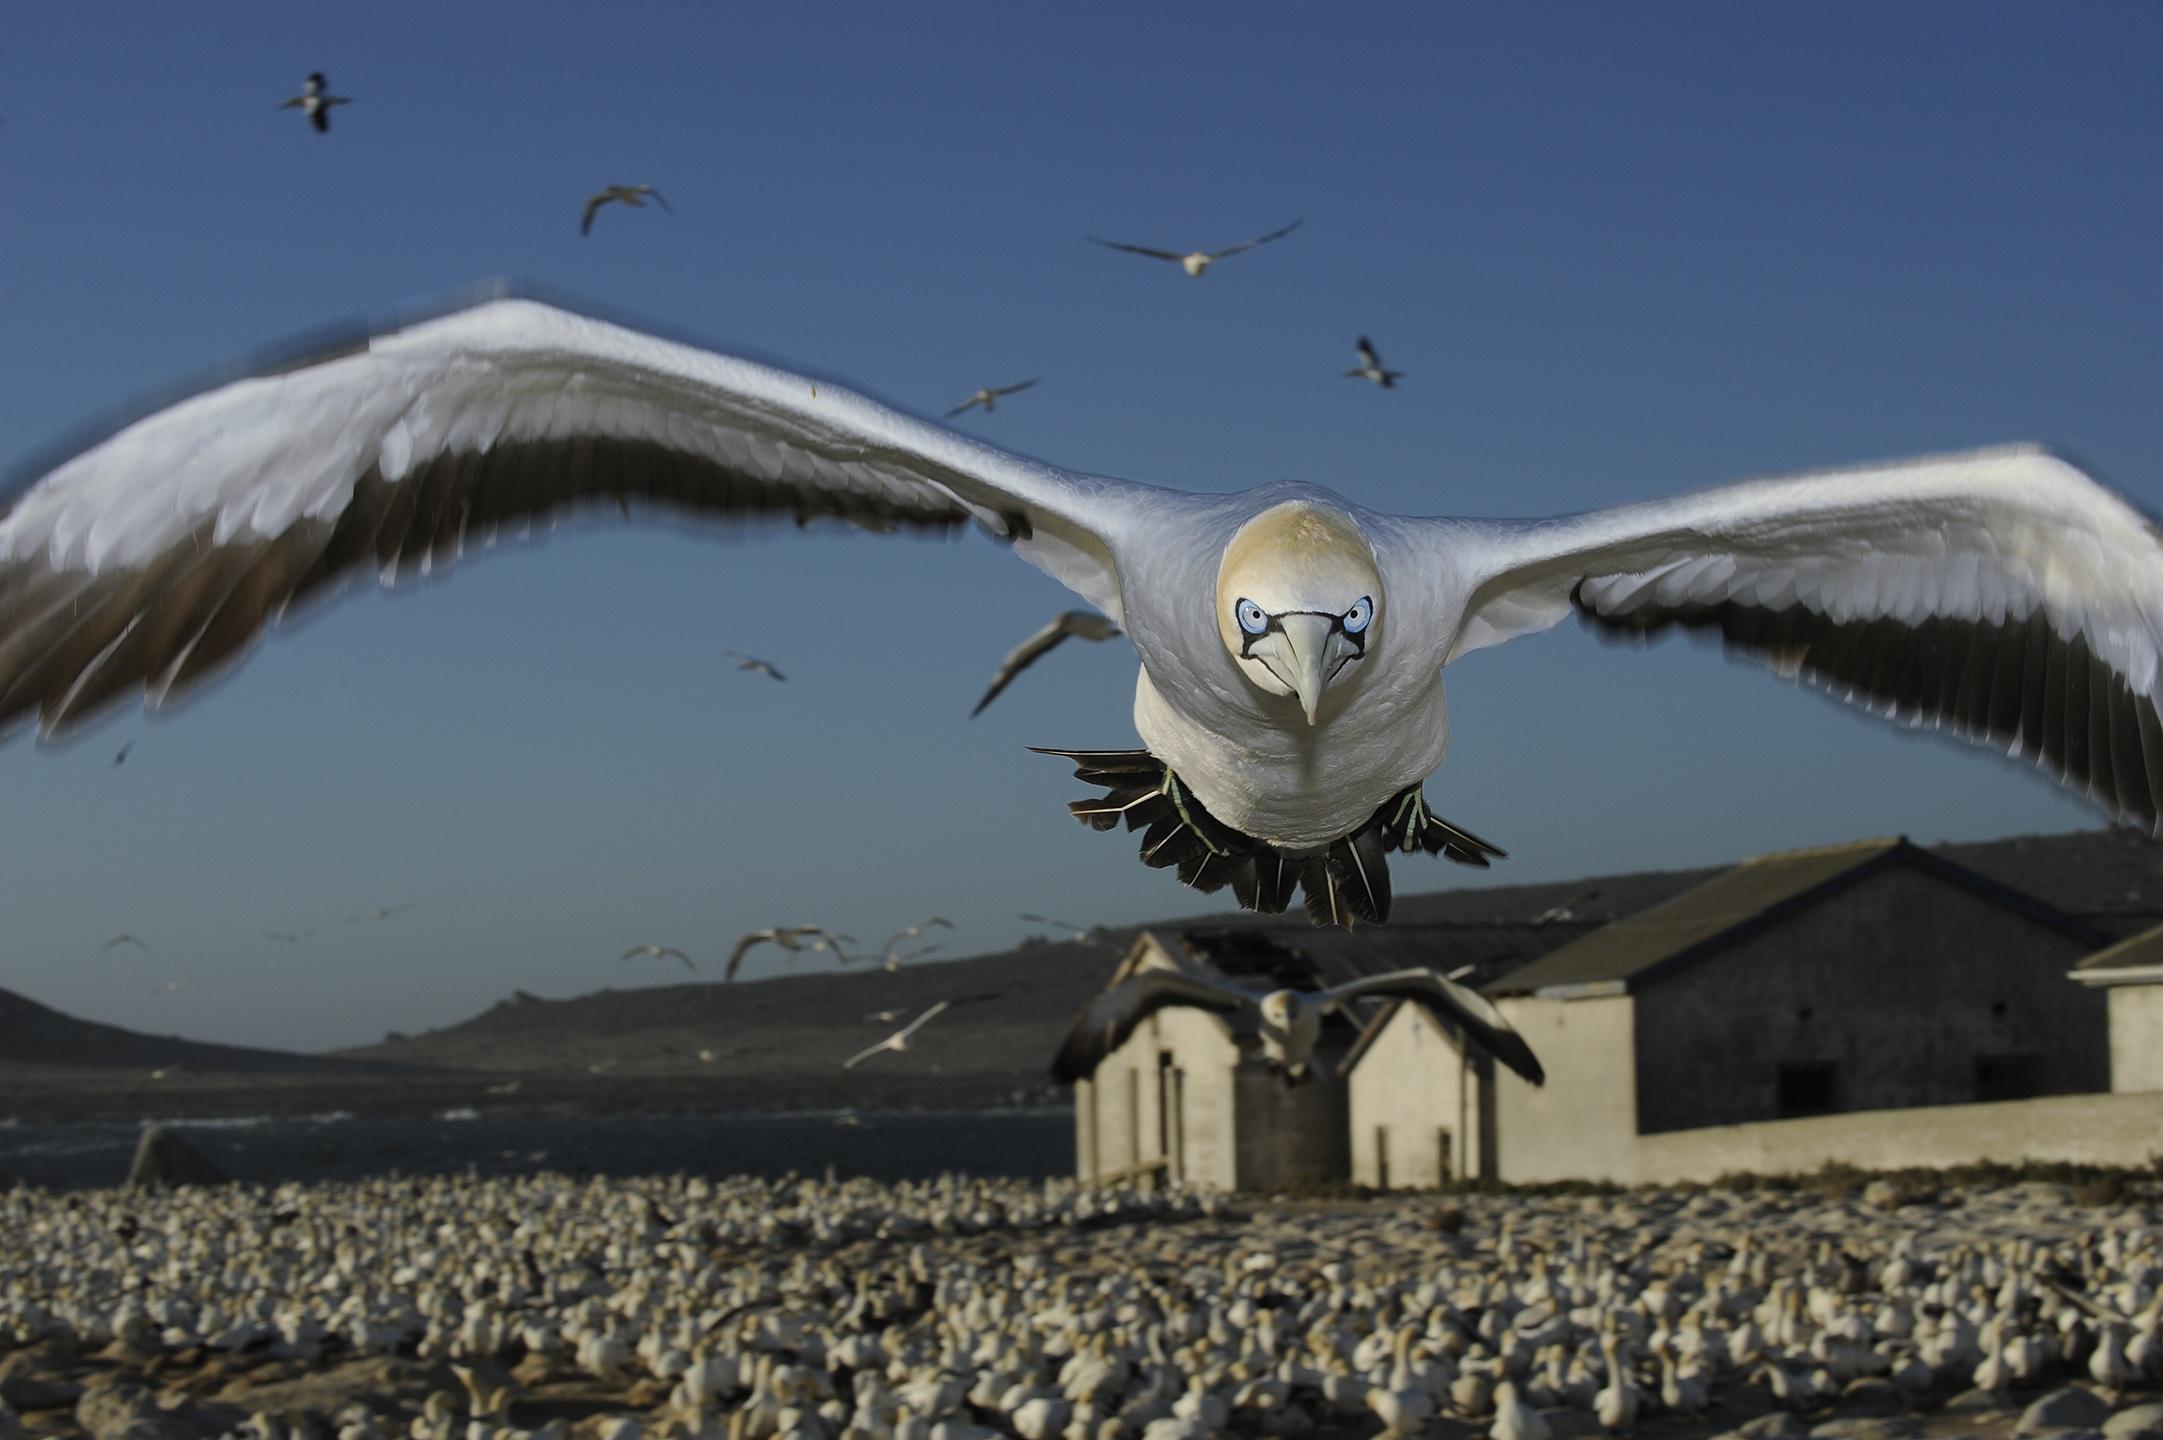 "1. nagroda w kategorii Natura - zdjęcie pojedyncze: Thomas P. Peschak, Germany/South Africa, Save Our Seas Foundation ""Cape Gannet comes to land, Malgas Island, South Africa"""